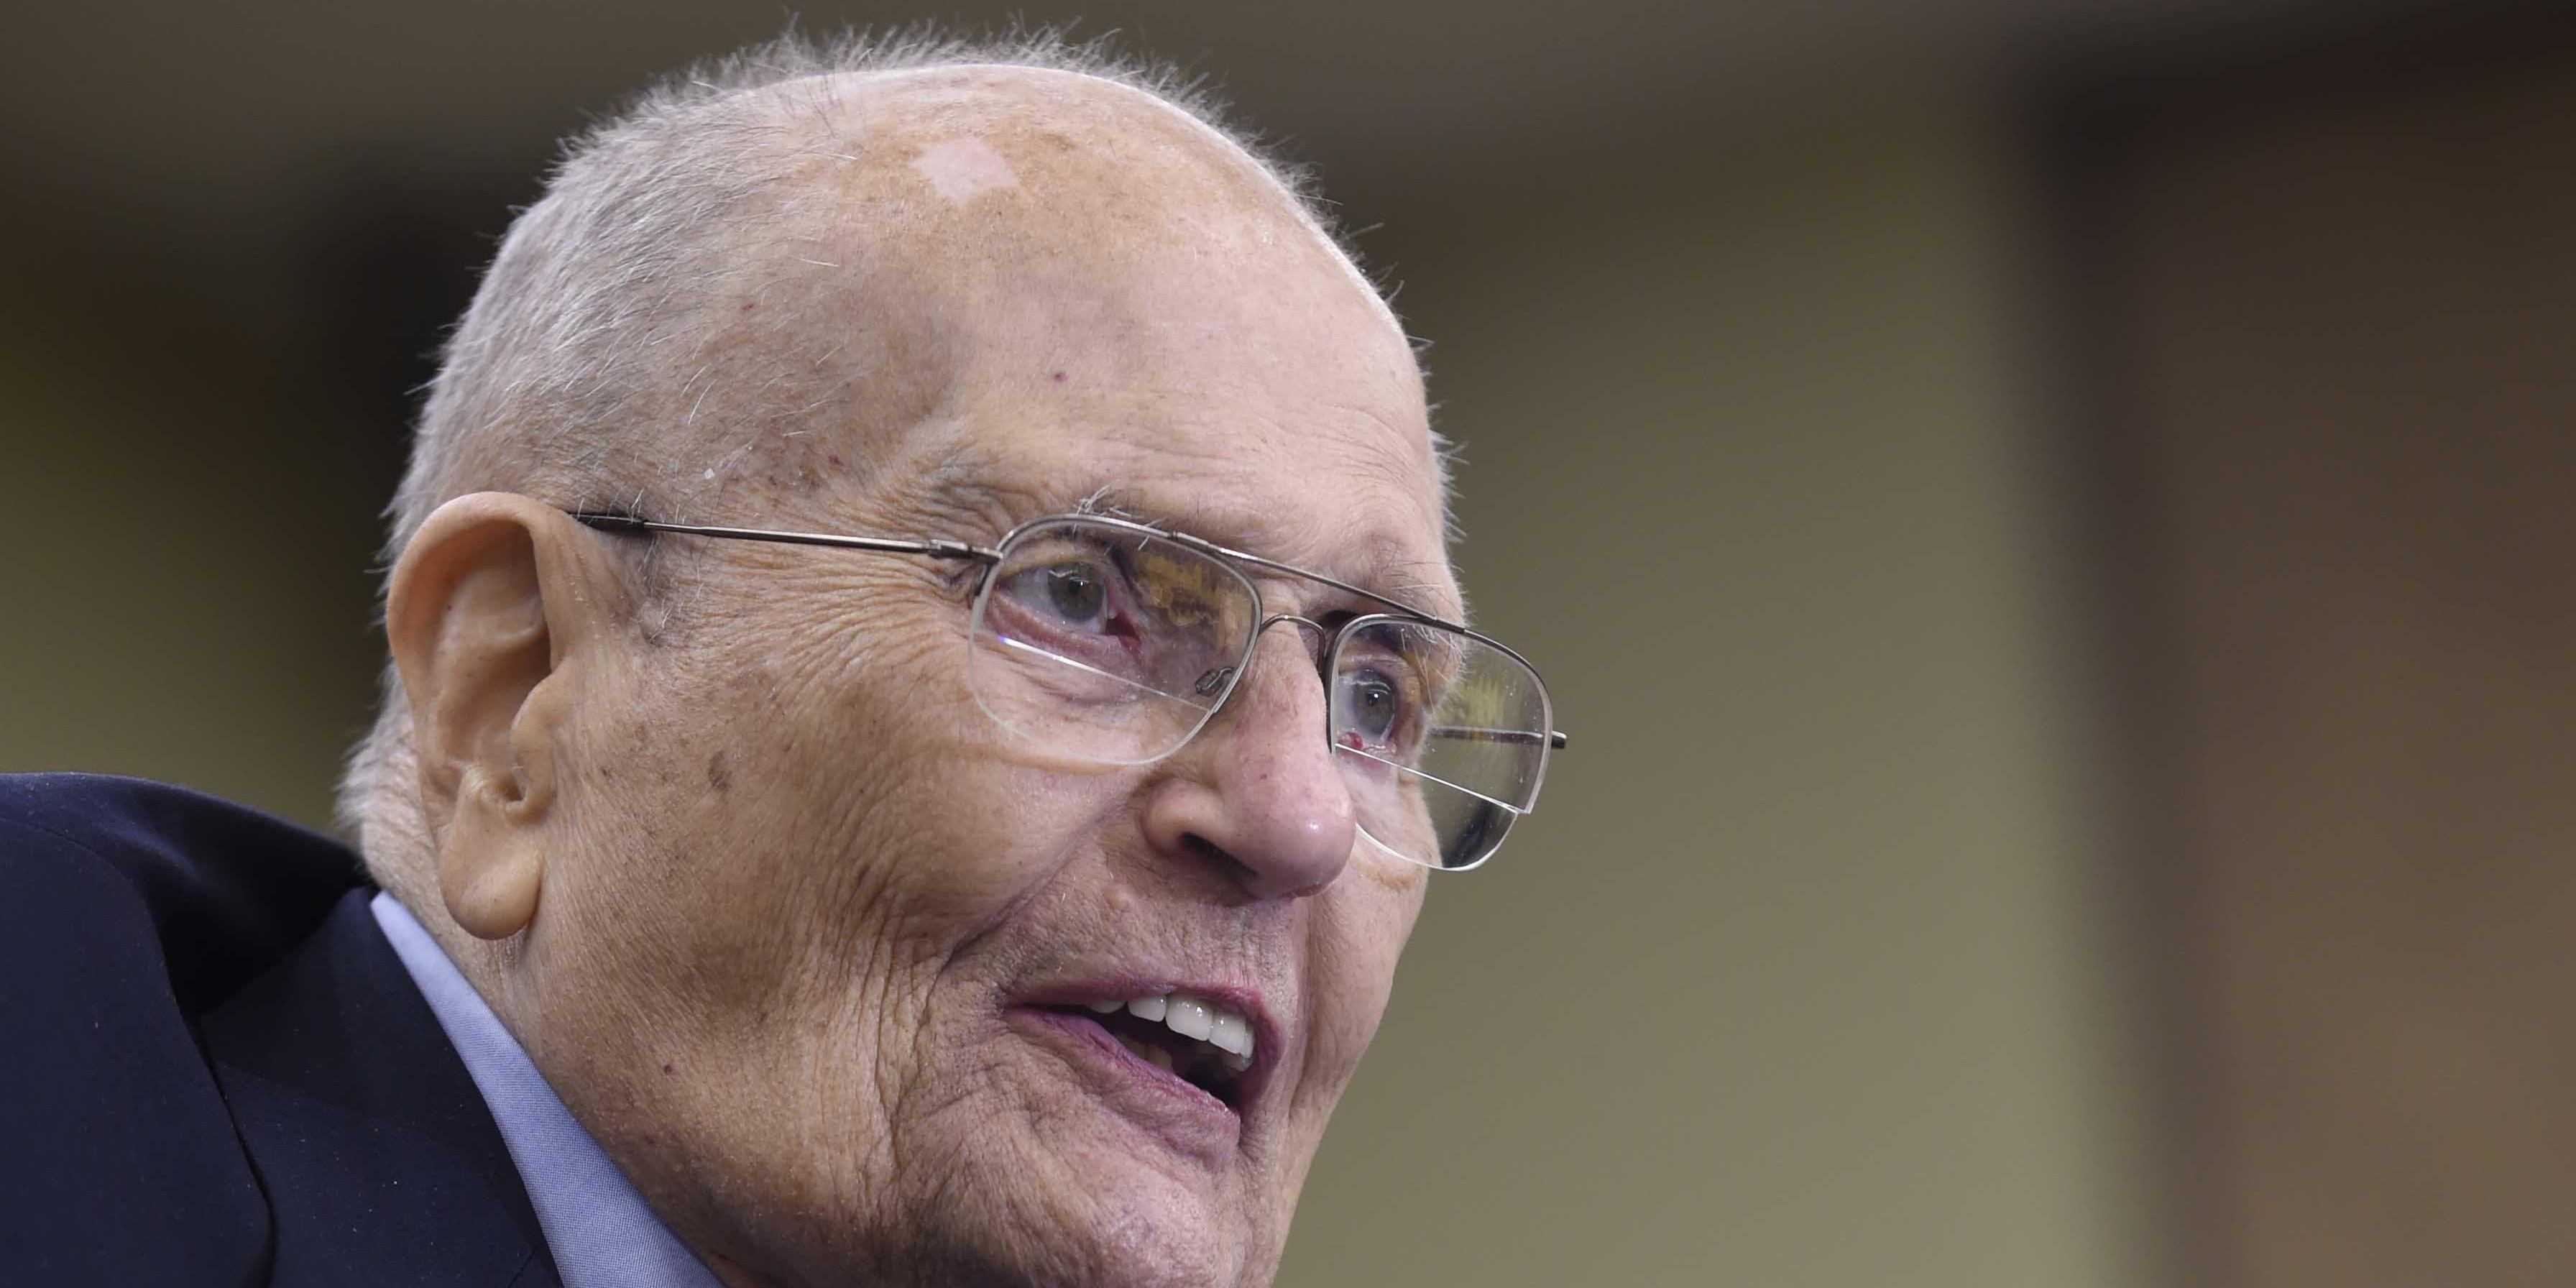 AP Source: Former Michigan Rep. John Dingell in hospice care